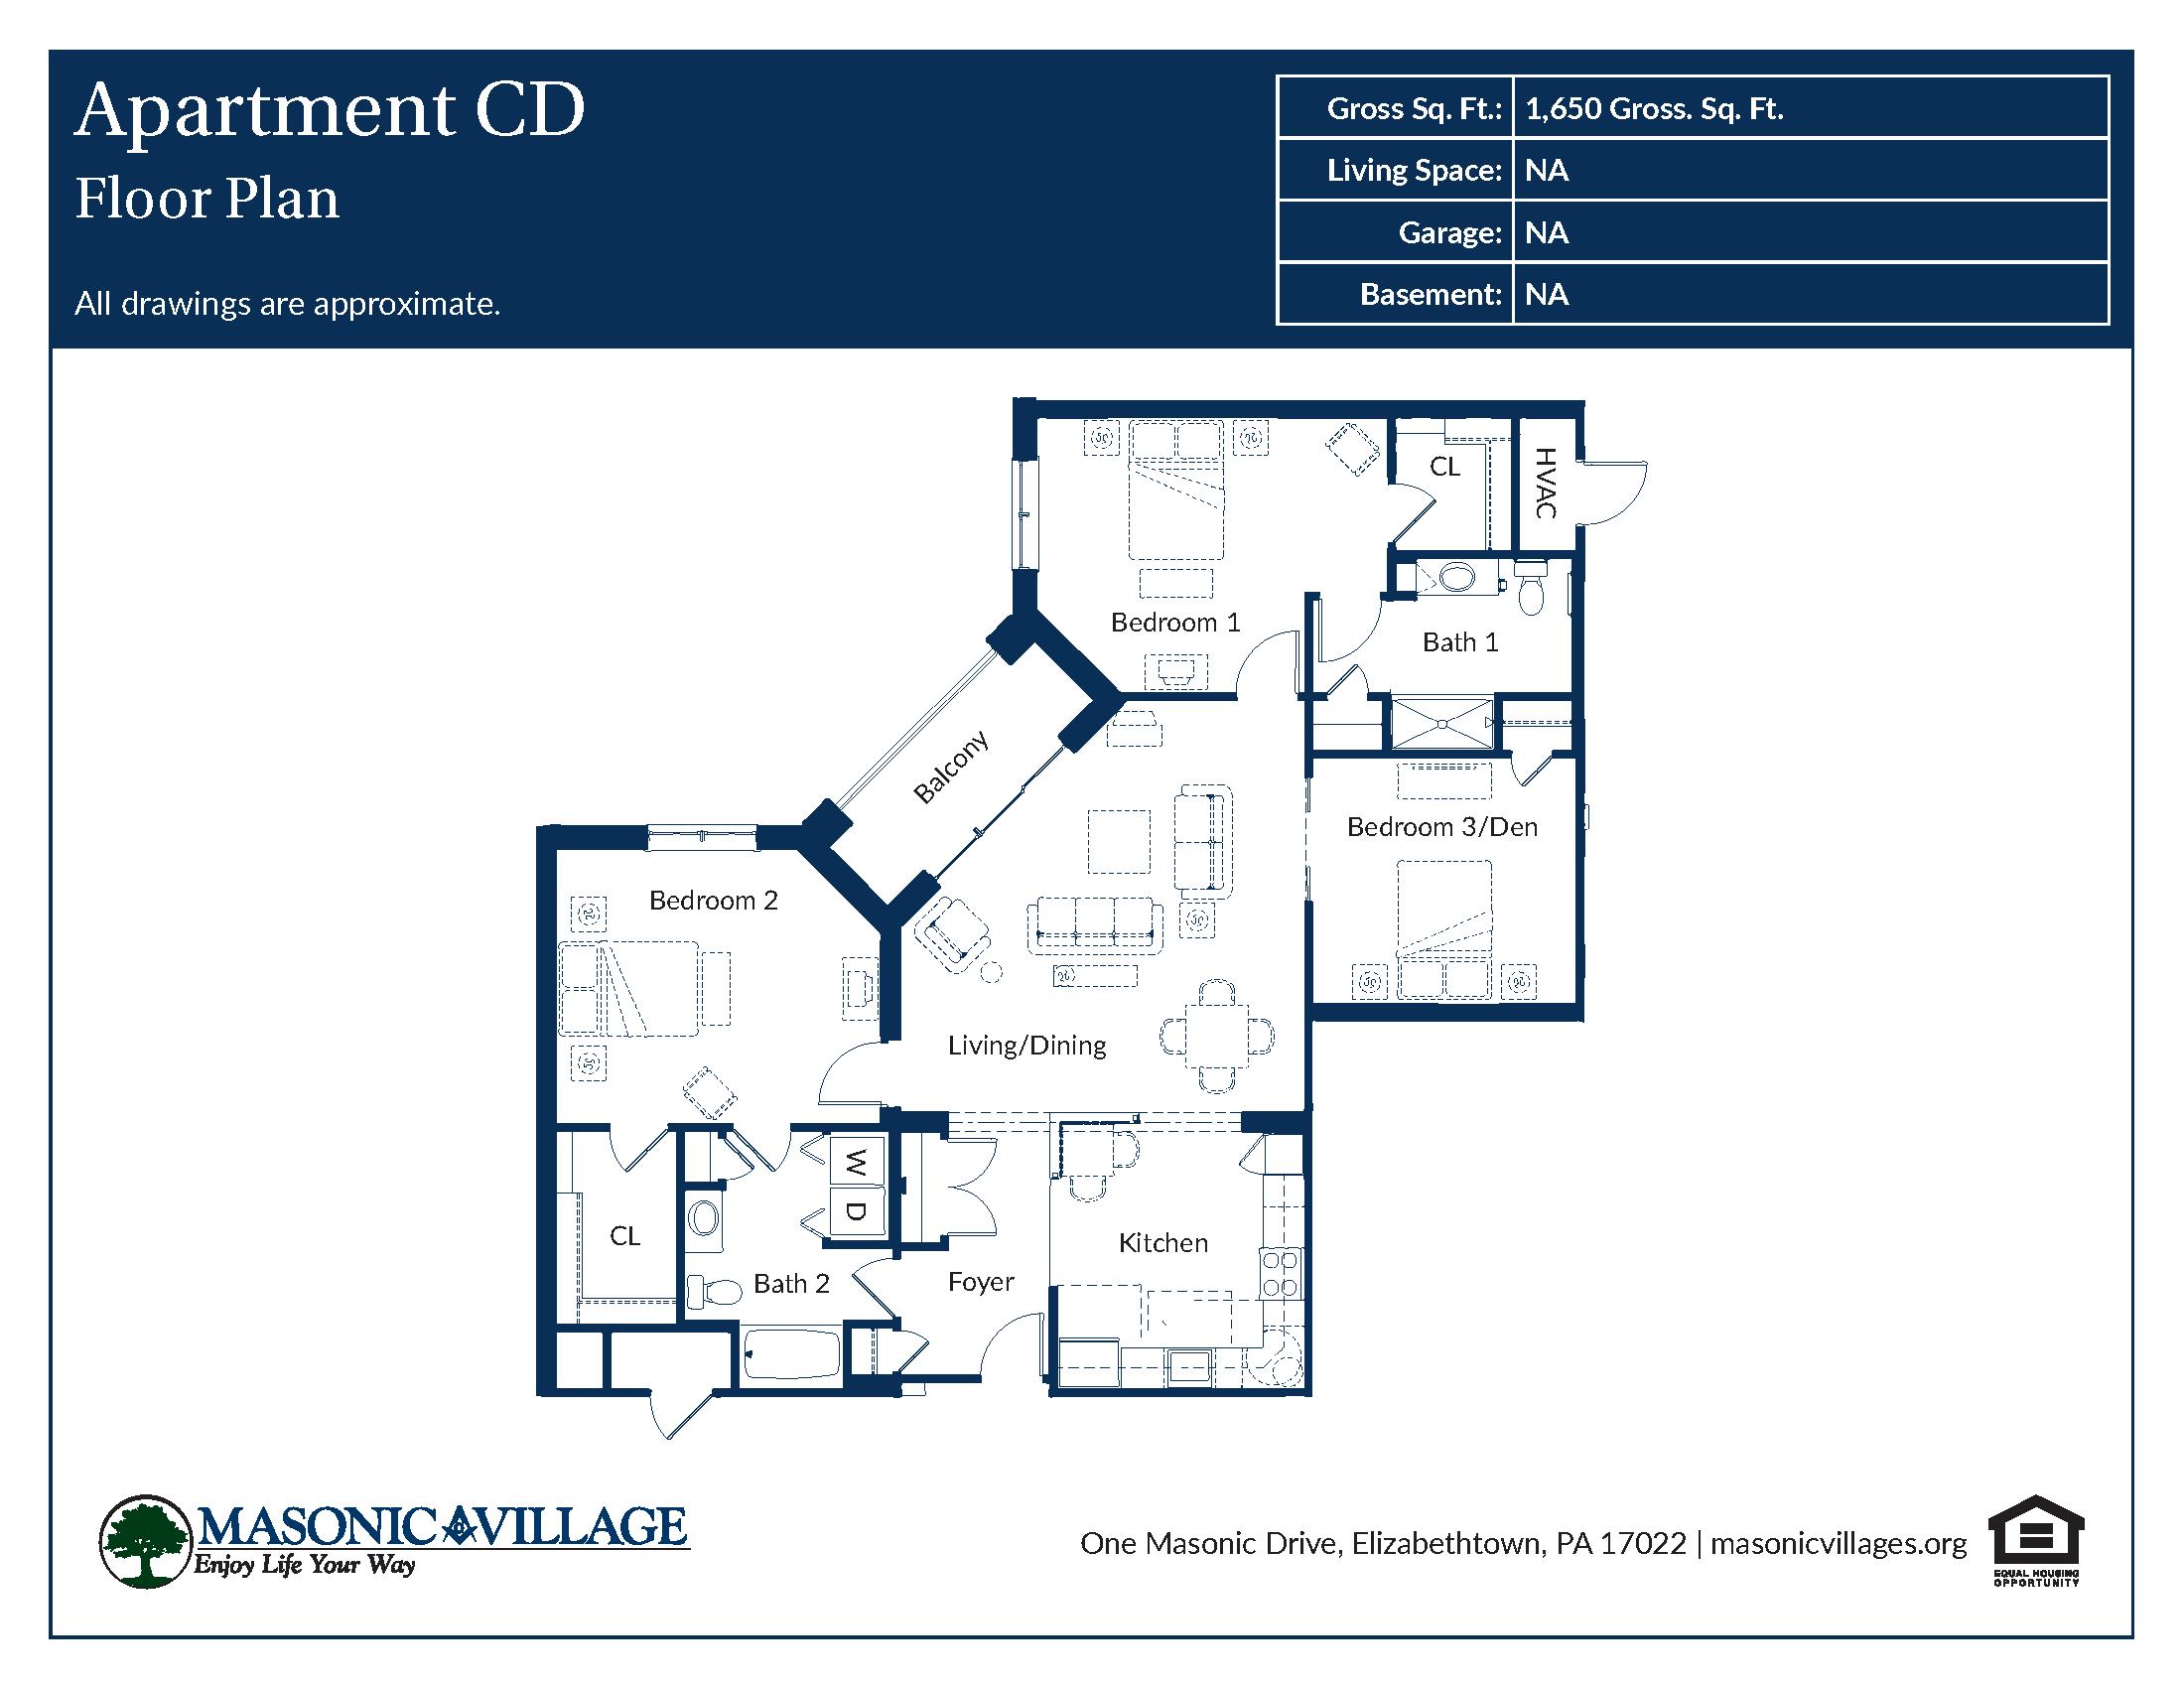 Masonic Village at Elizabethtown - Apartment CD Floor Plan